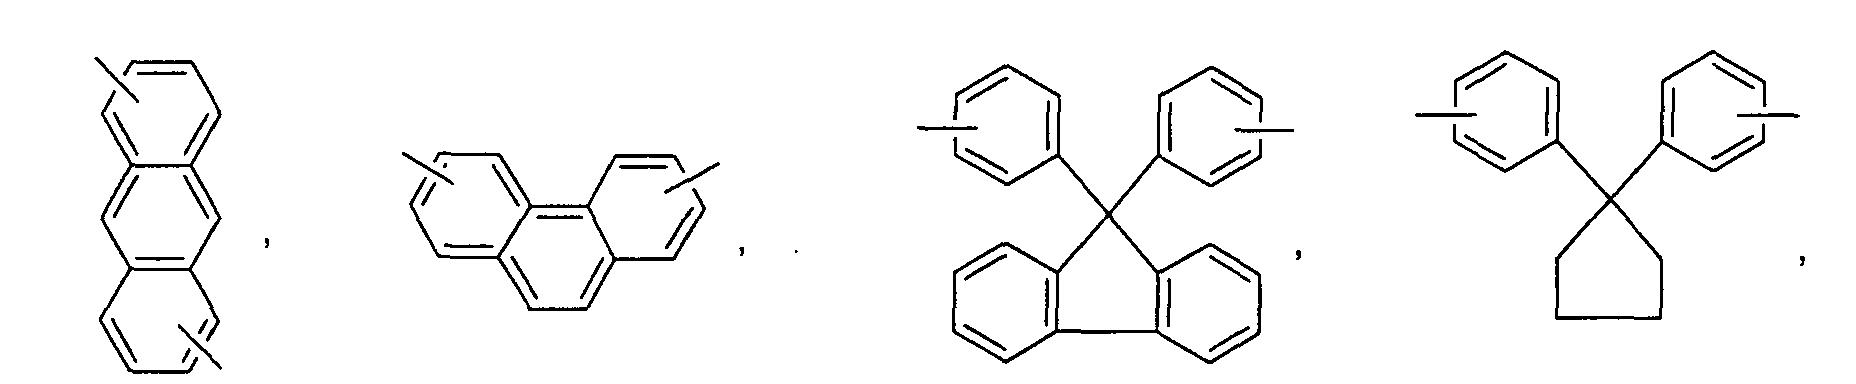 Figure 00050006